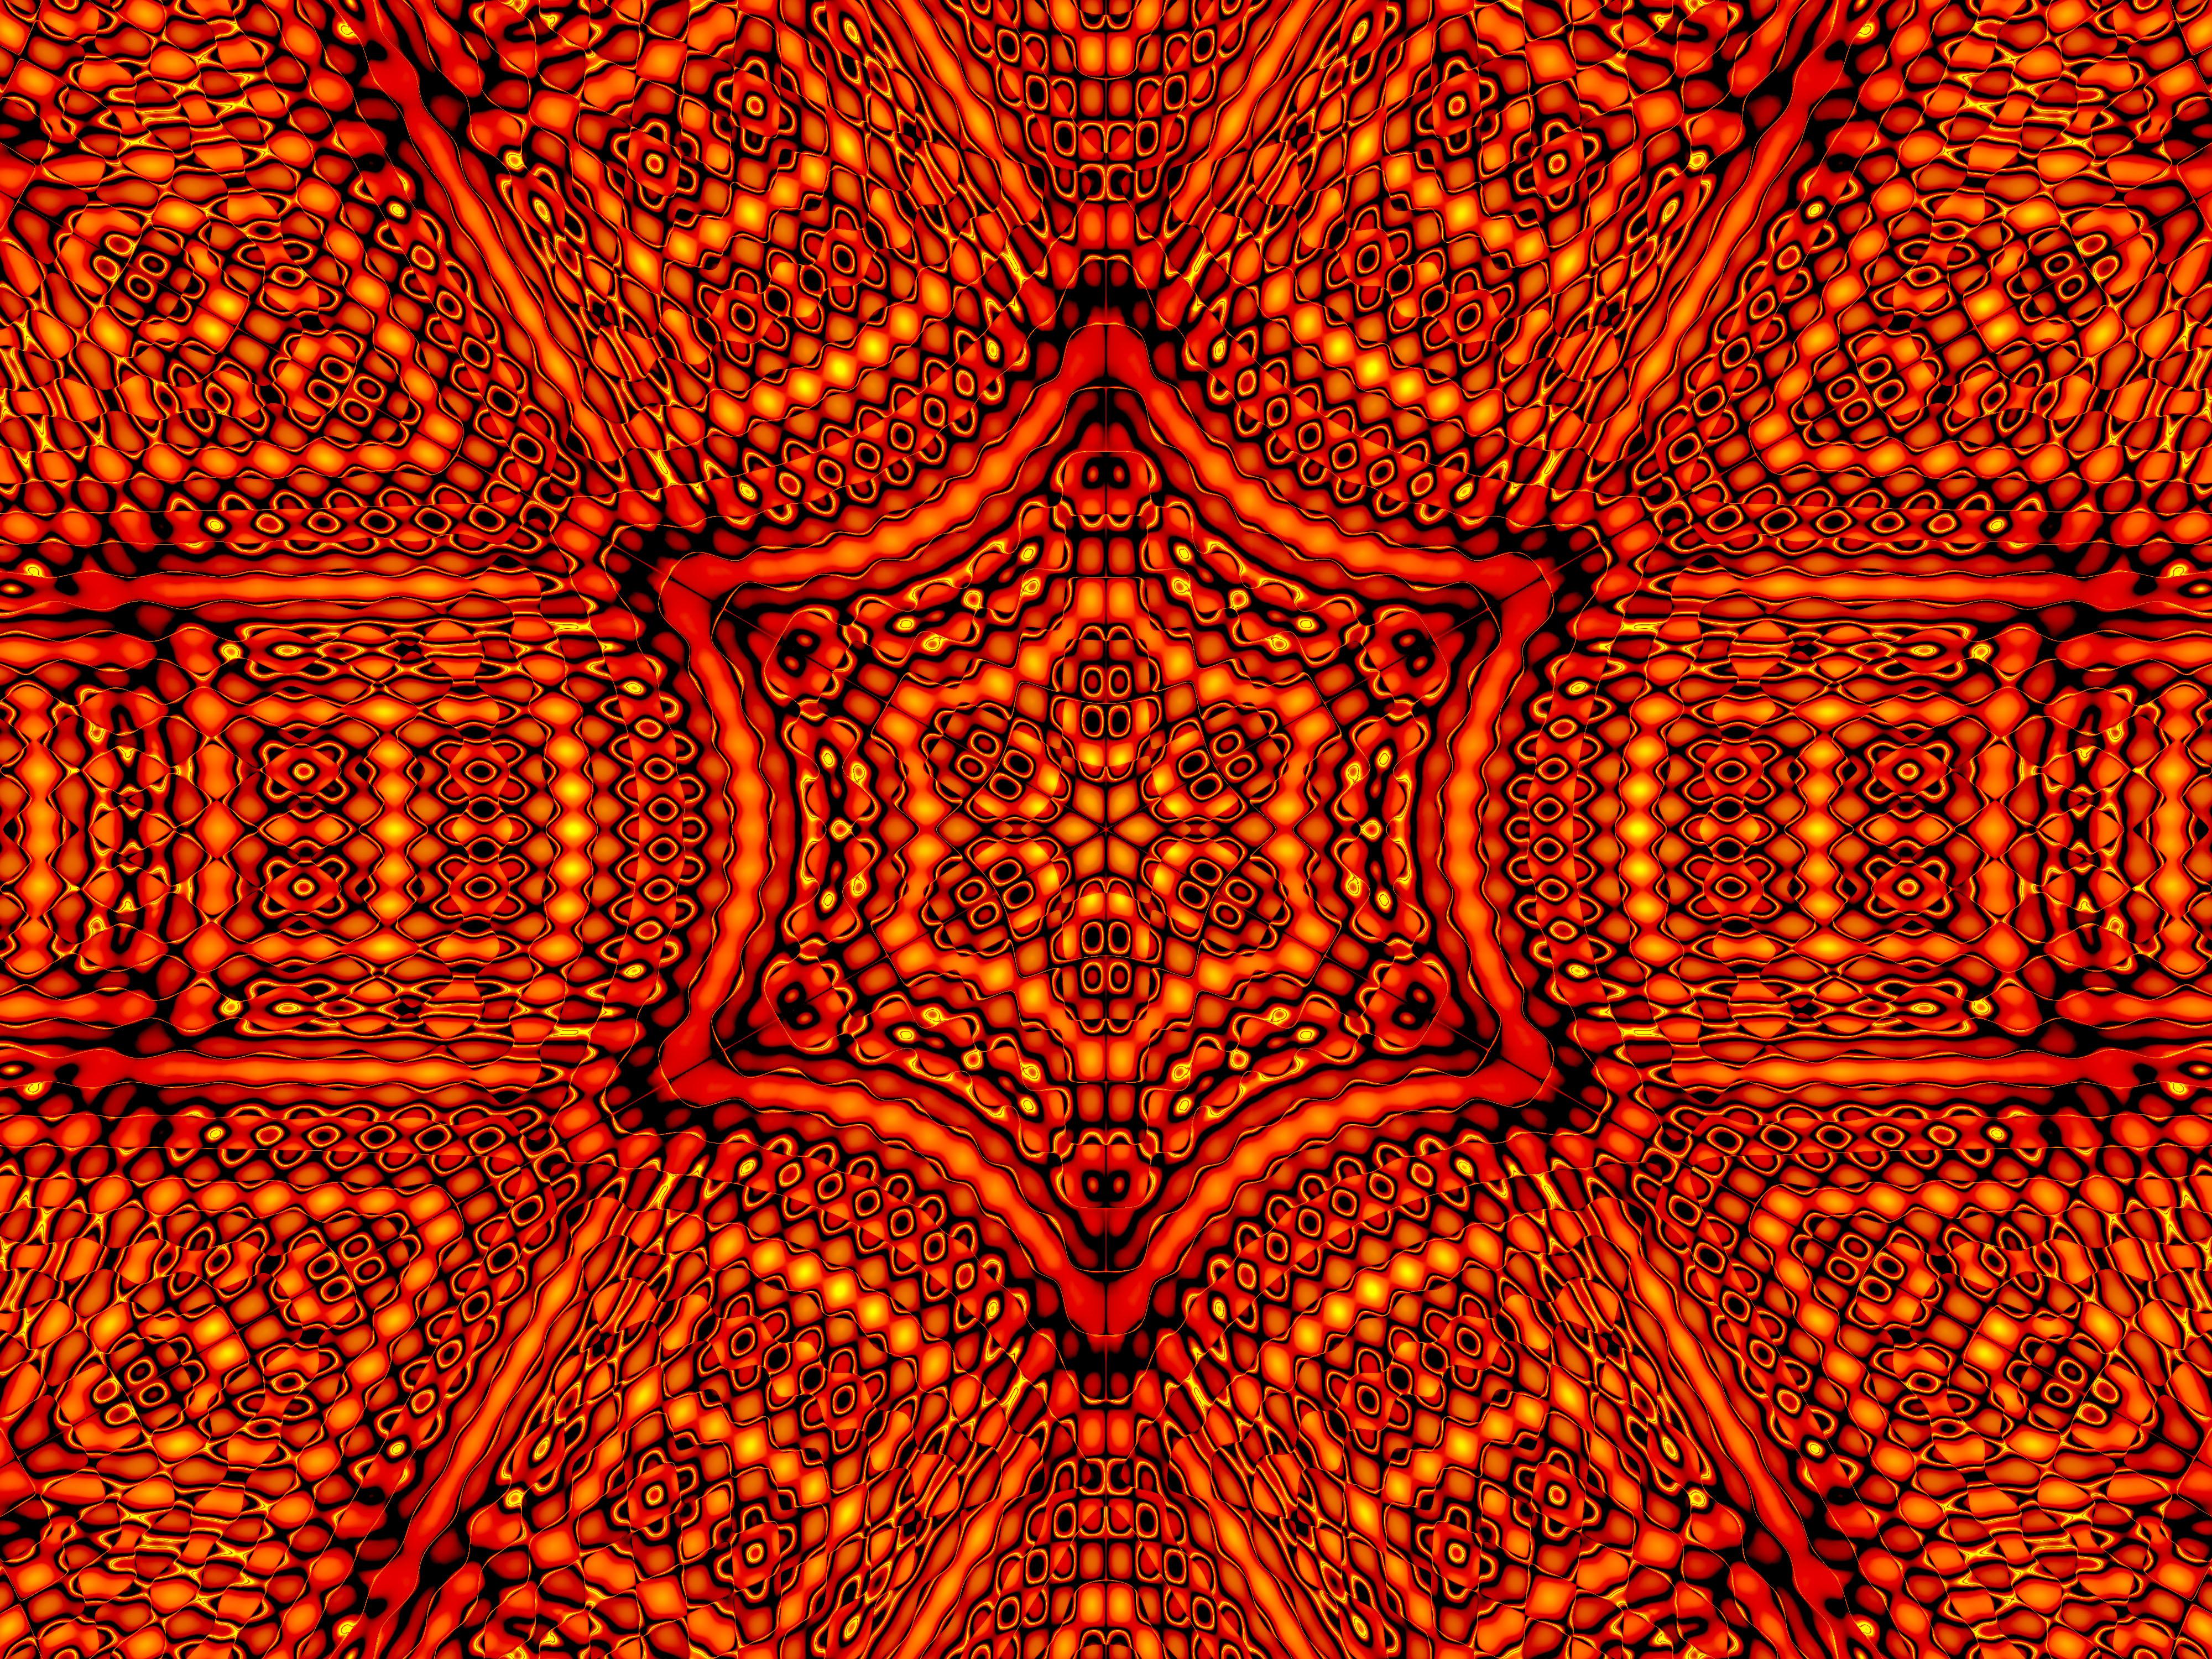 Artistic Colorful Digital Art 4000x3000